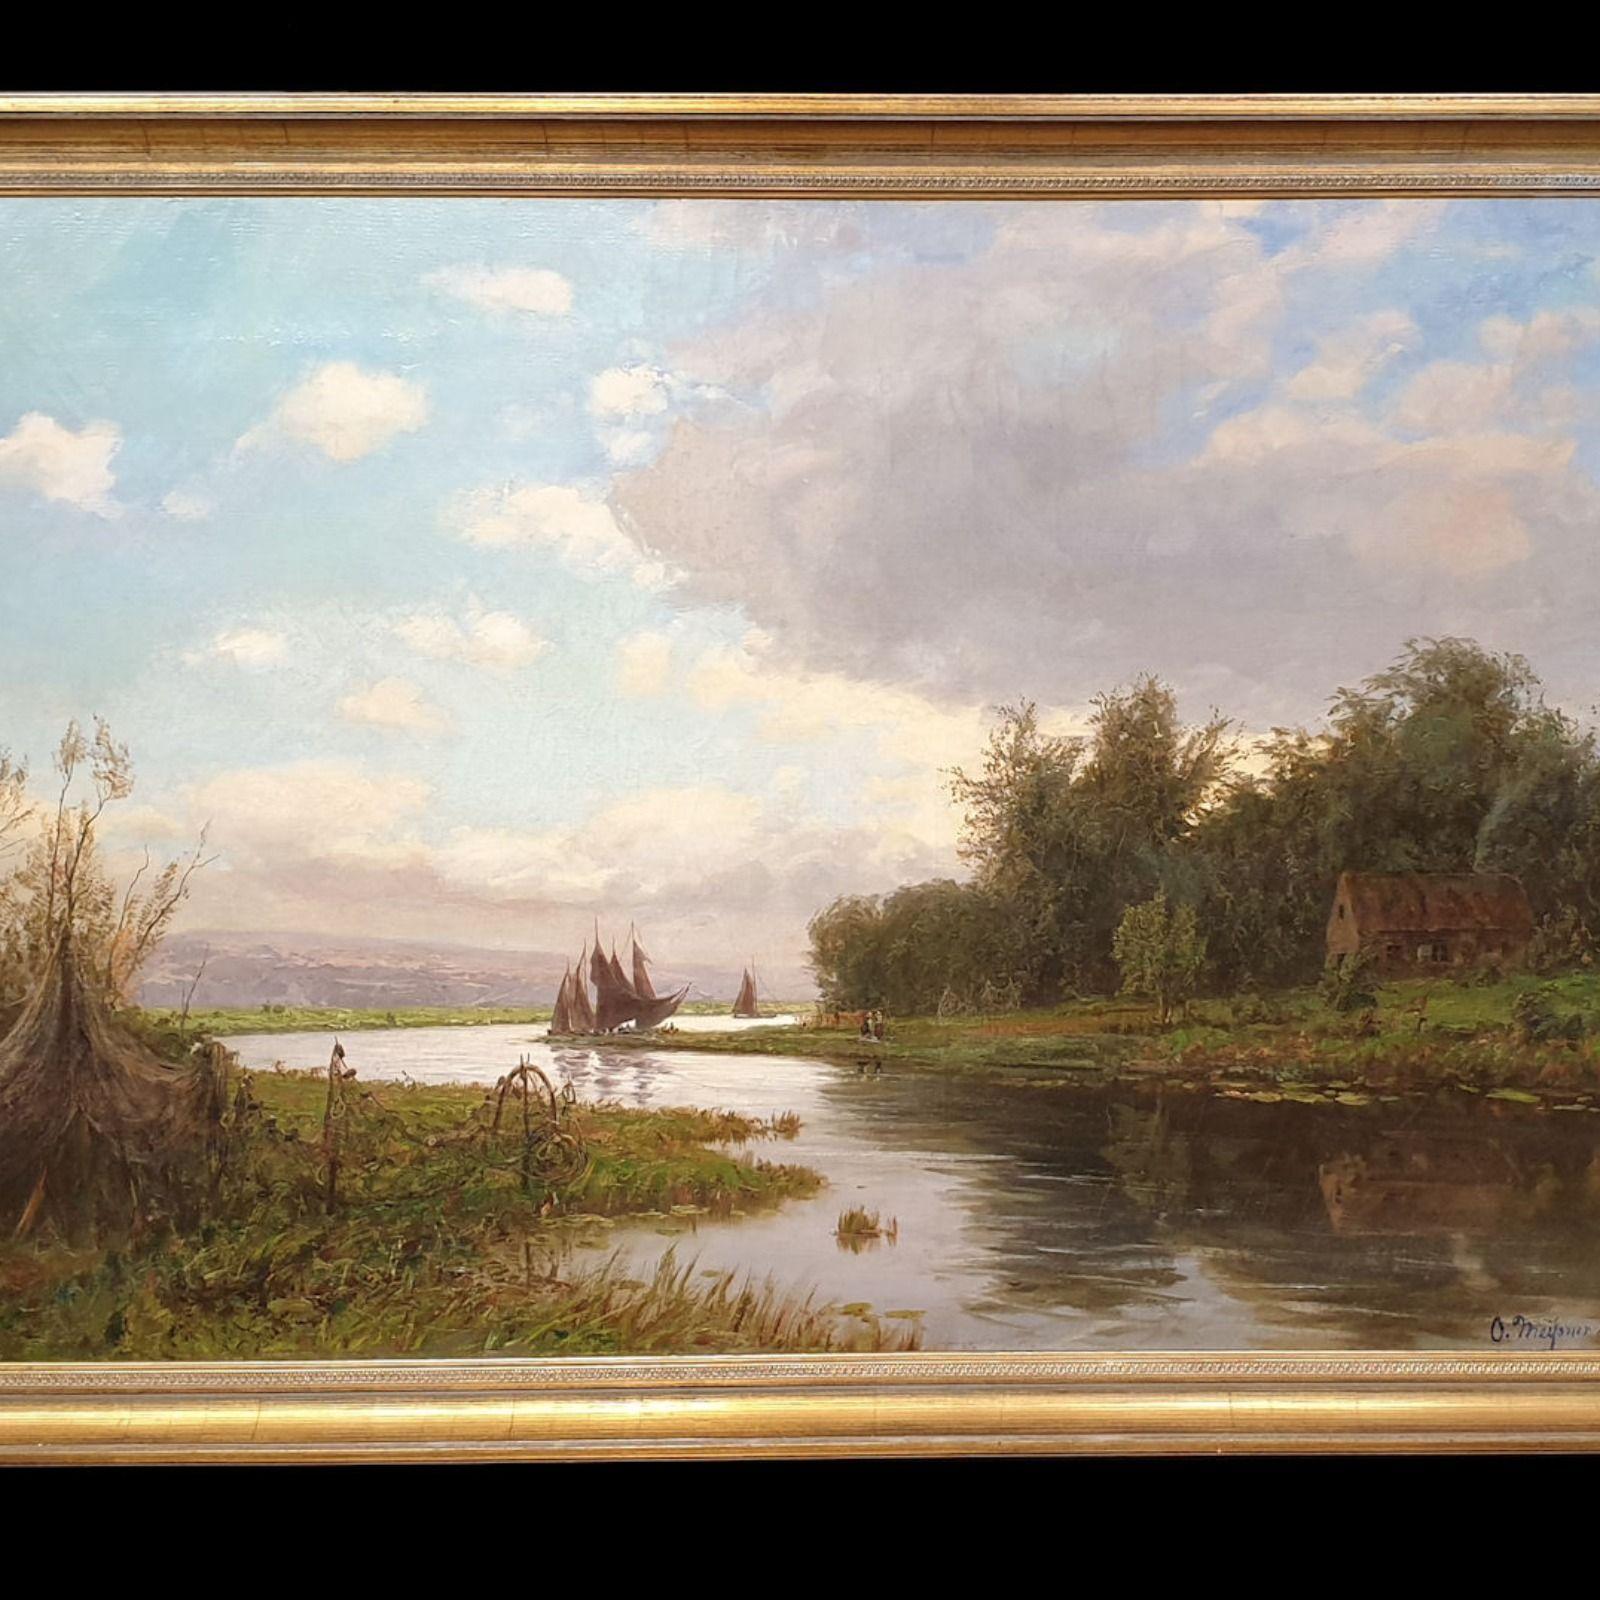 Am Niederrhein Antik Gemälde Olga Meissner 1895 Gemälde Ölgemälde Galerierahmen